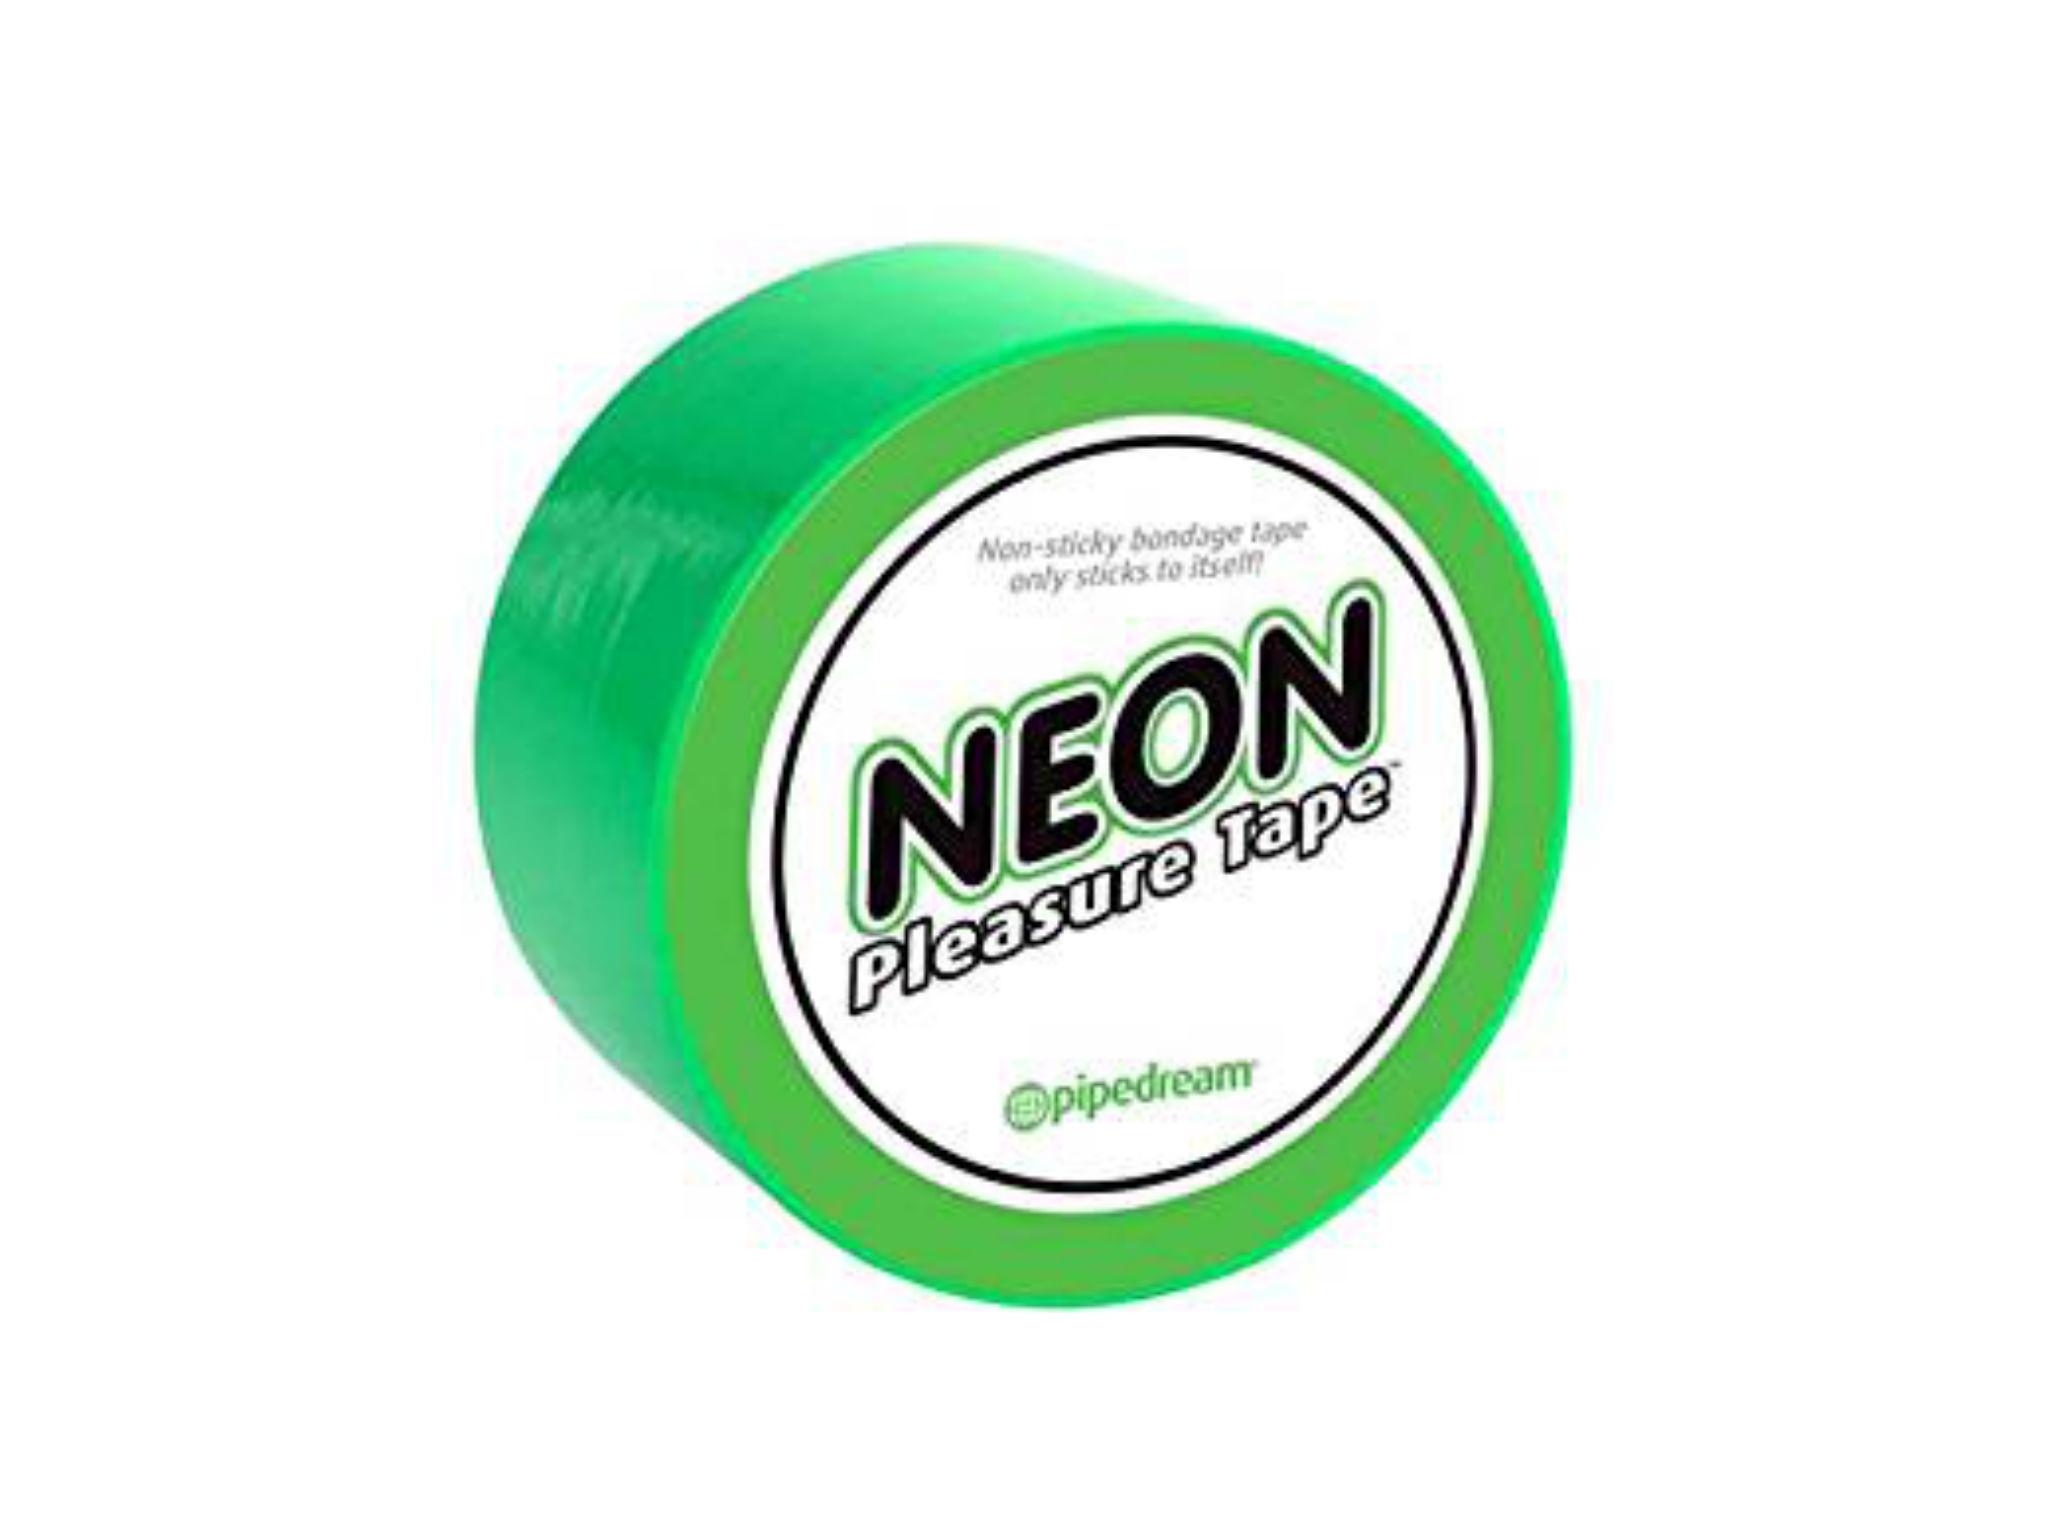 Neon Pleasure Tape